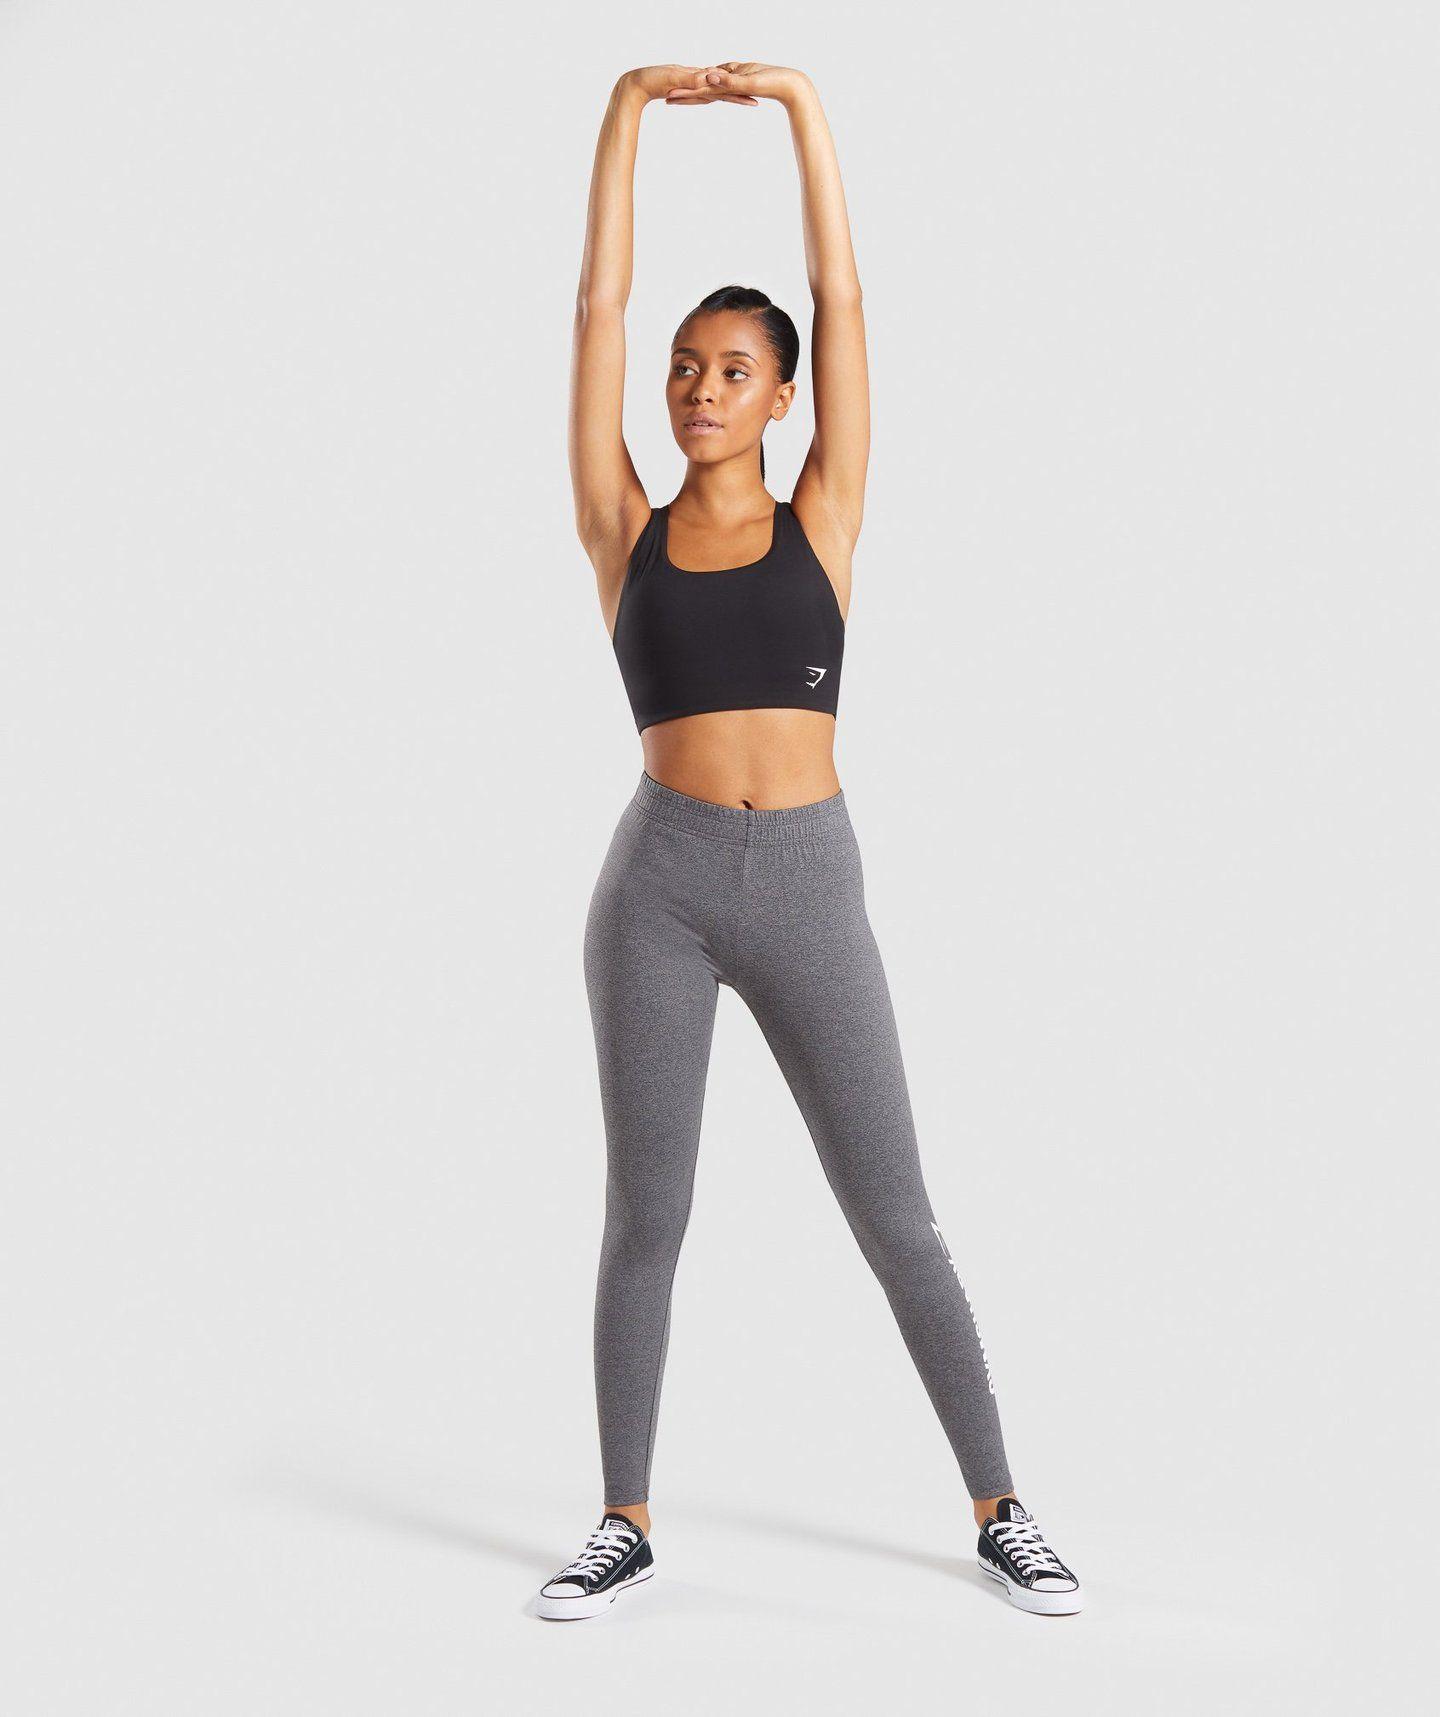 8abad51f6fc5a Gymshark Core Leggings - Charcoal Marl   gym   Gym leggings ...